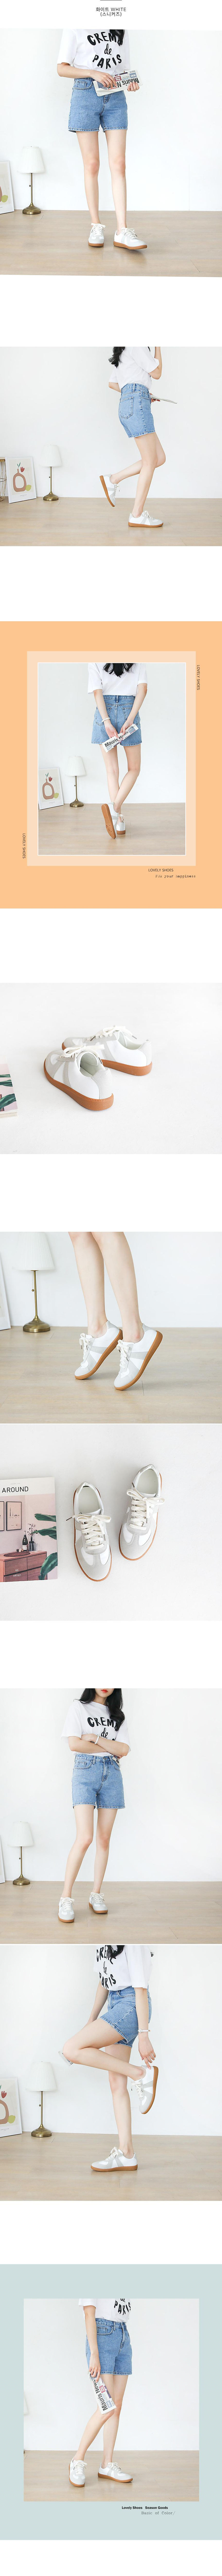 Lesia sneakers & blowers 2cm